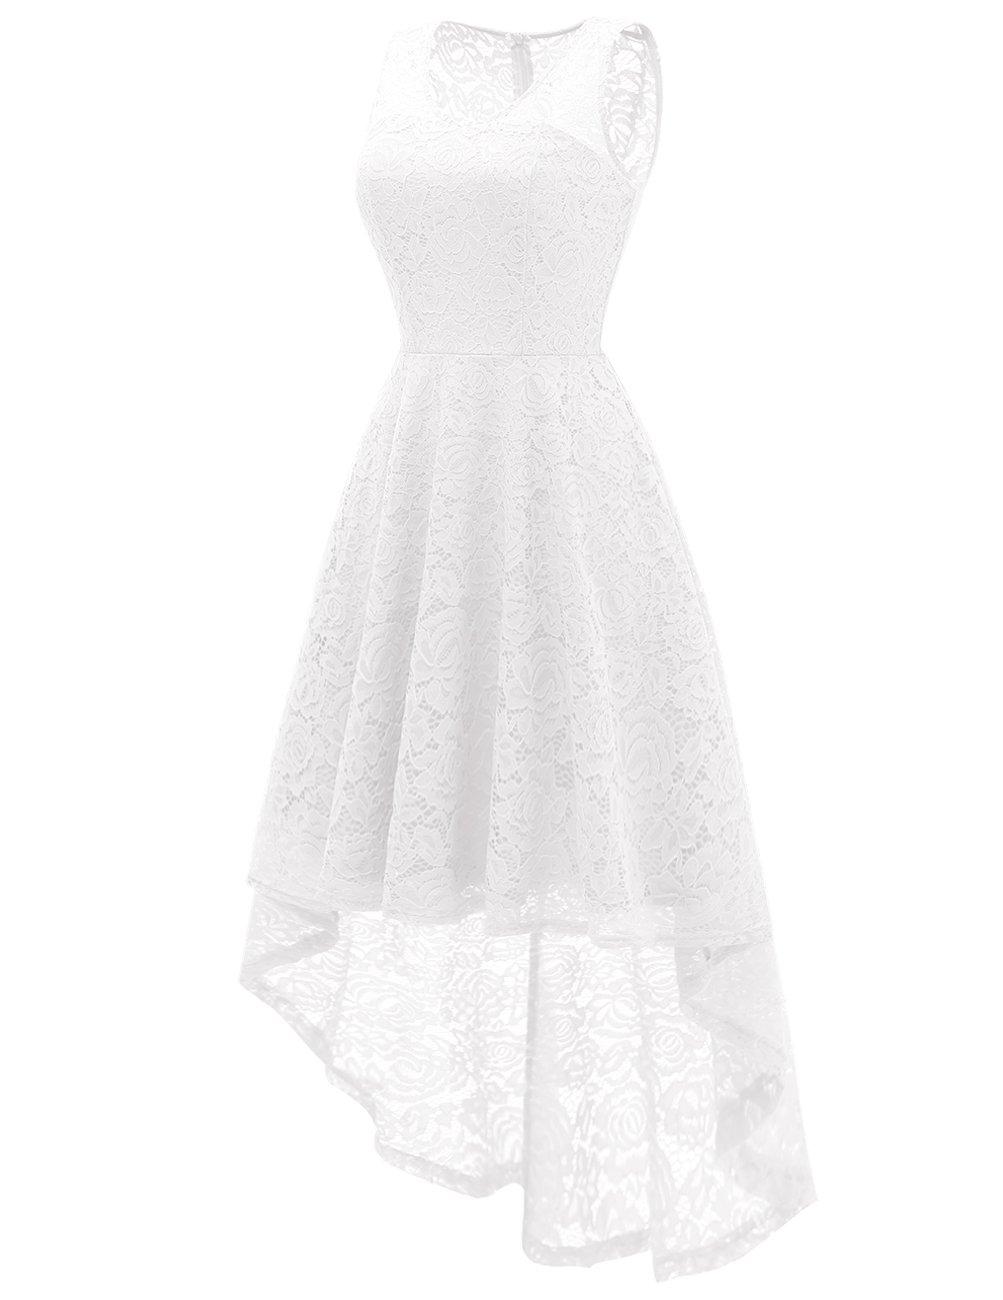 DRESSTELLS Women's Cocktail V-Neck Dress Floral Lace Hi-Lo Formal Swing Party Dress White XL by DRESSTELLS (Image #2)